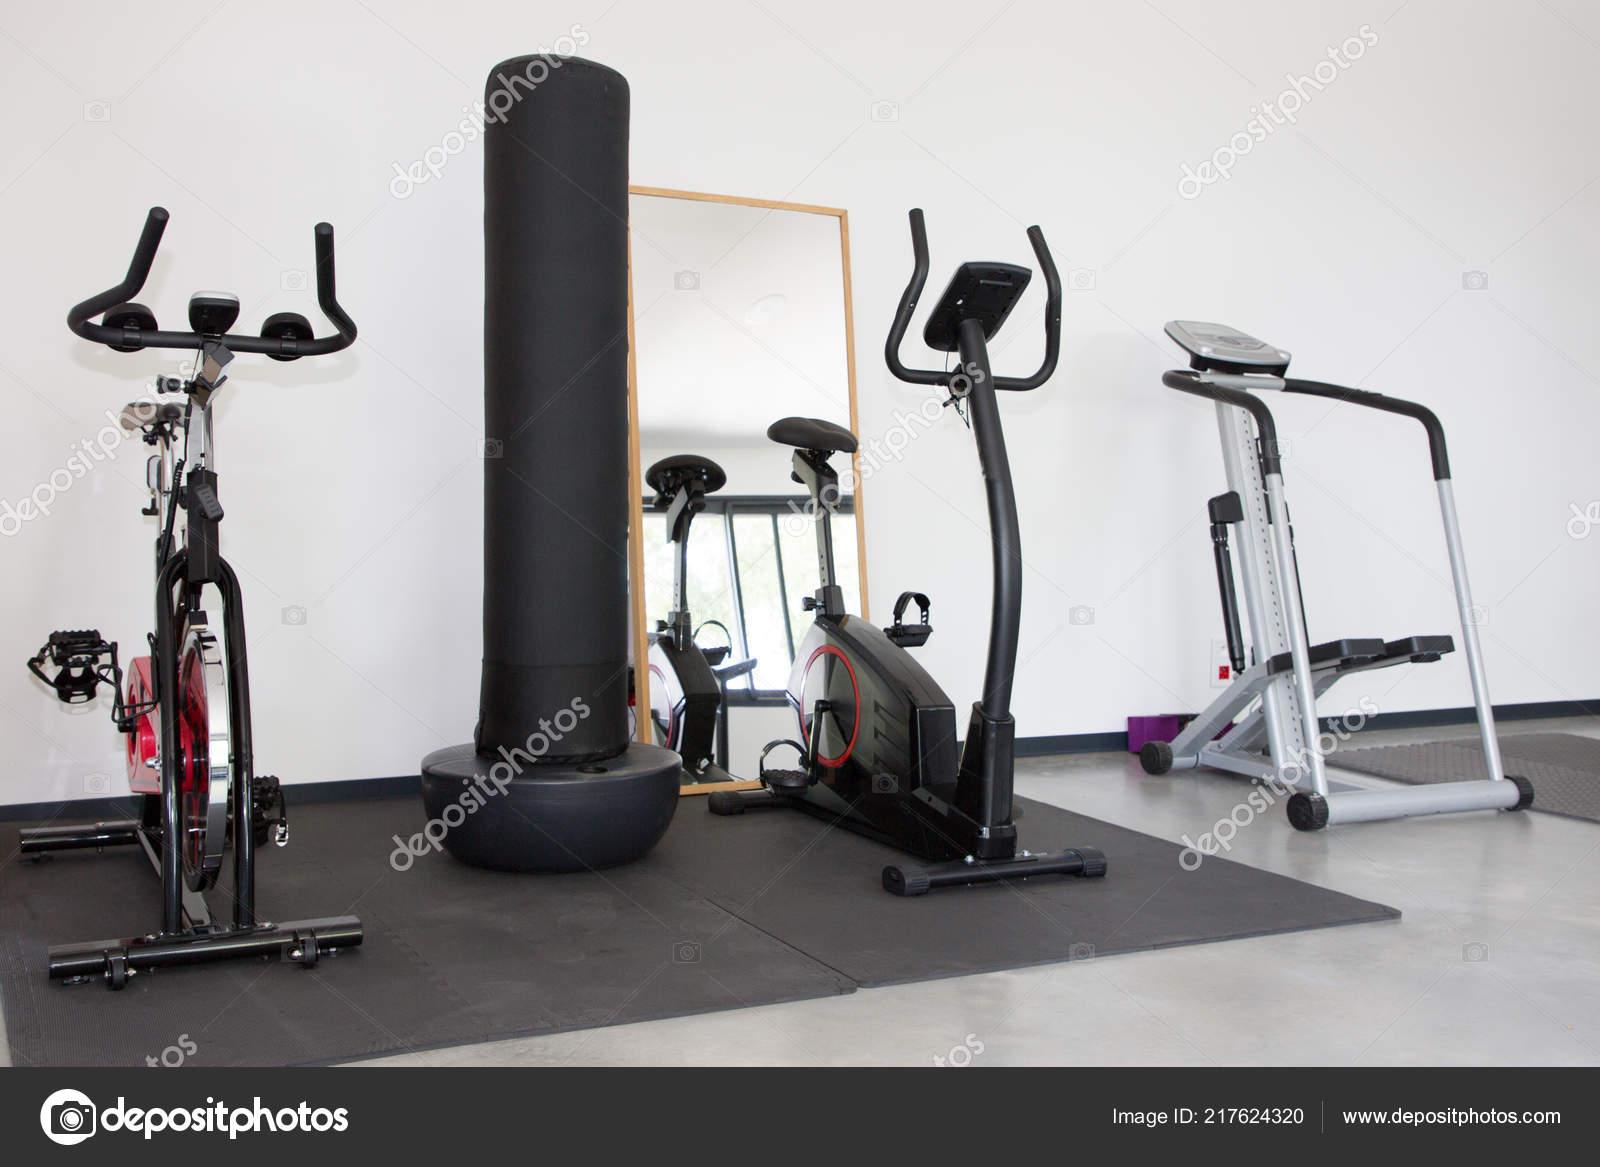 Row sports equipment empty modern gym room fitness center u stock